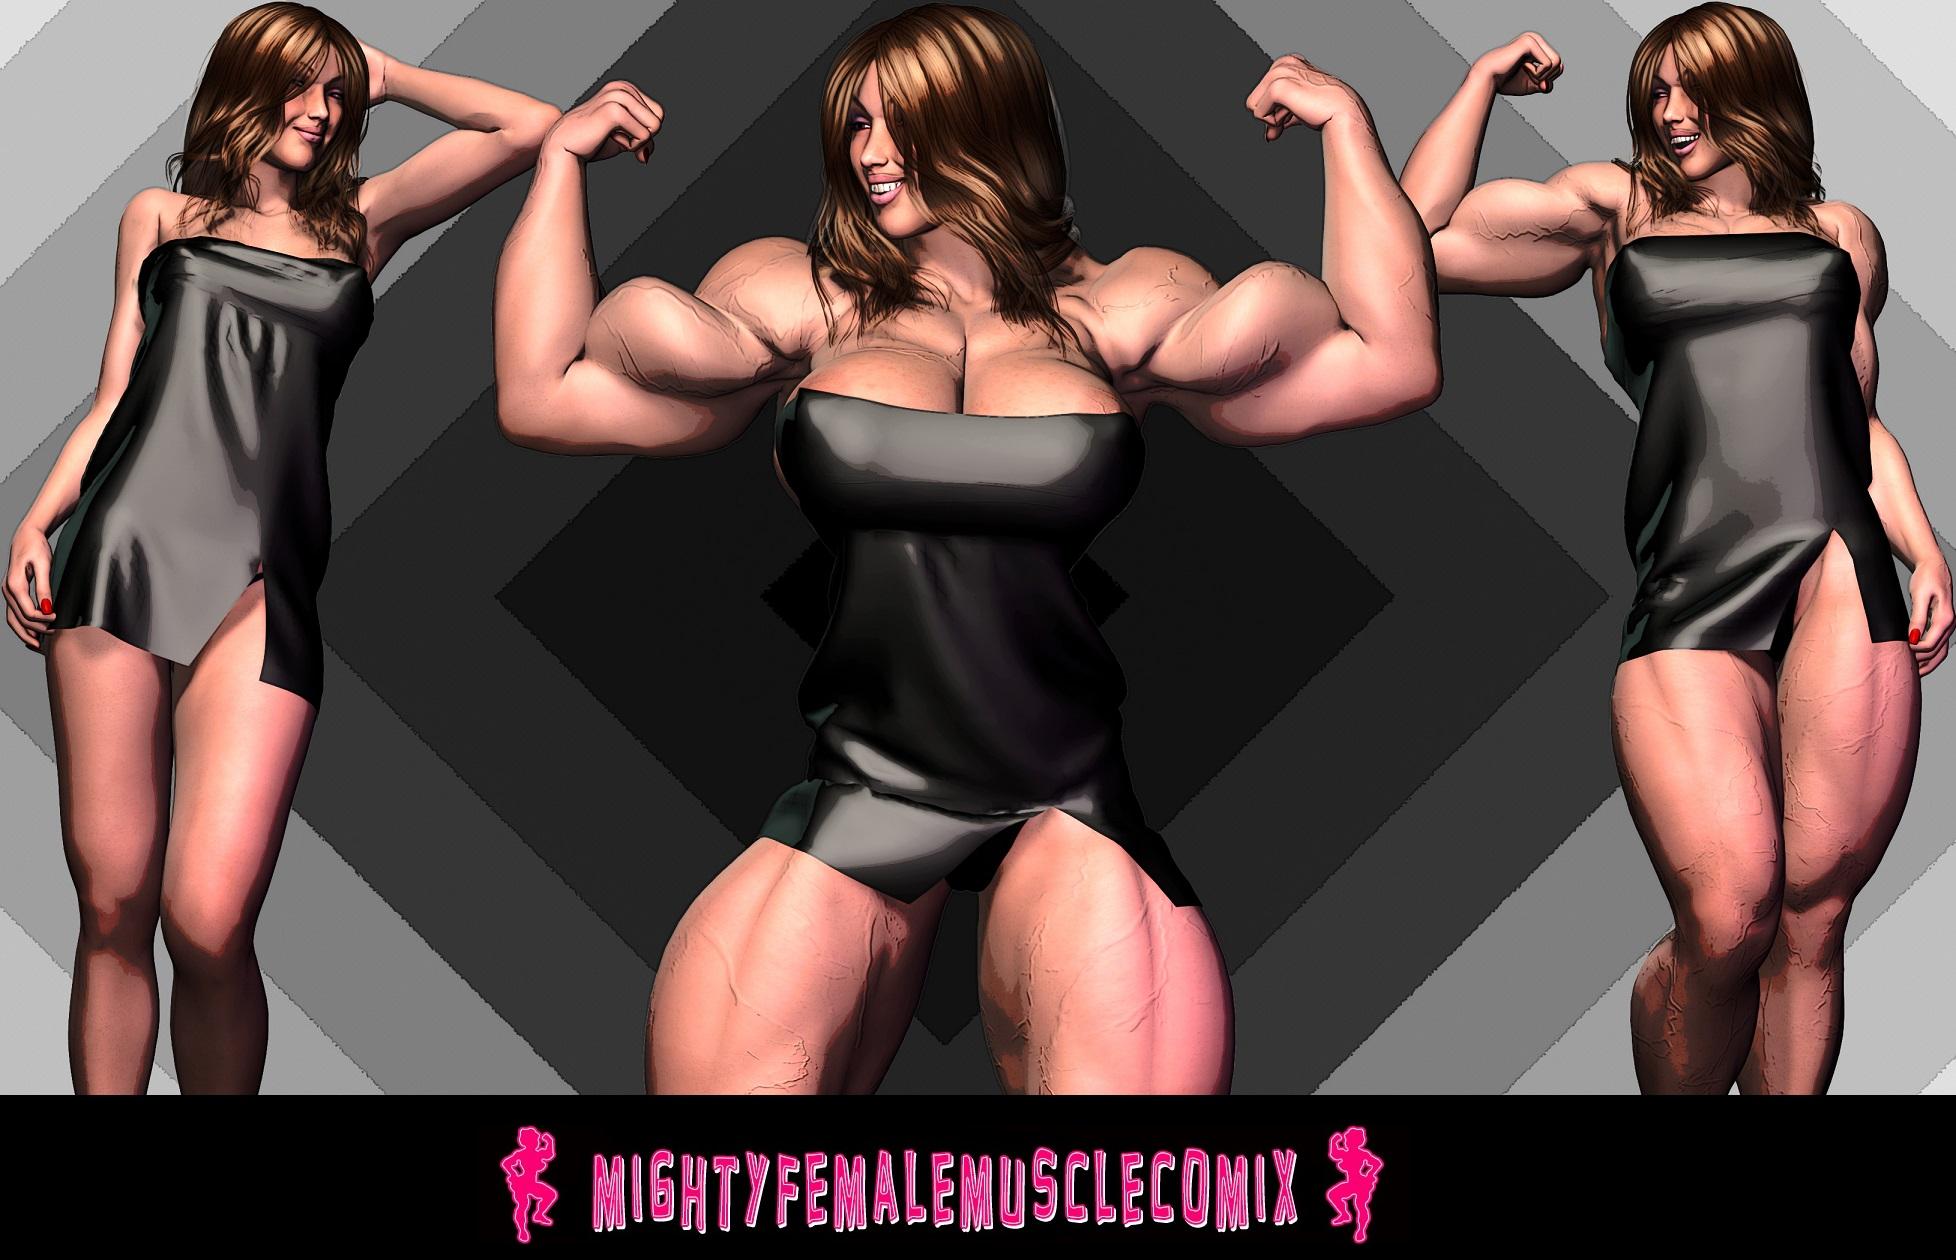 FMG Striptease Sample 4 by SteeleBlazer84